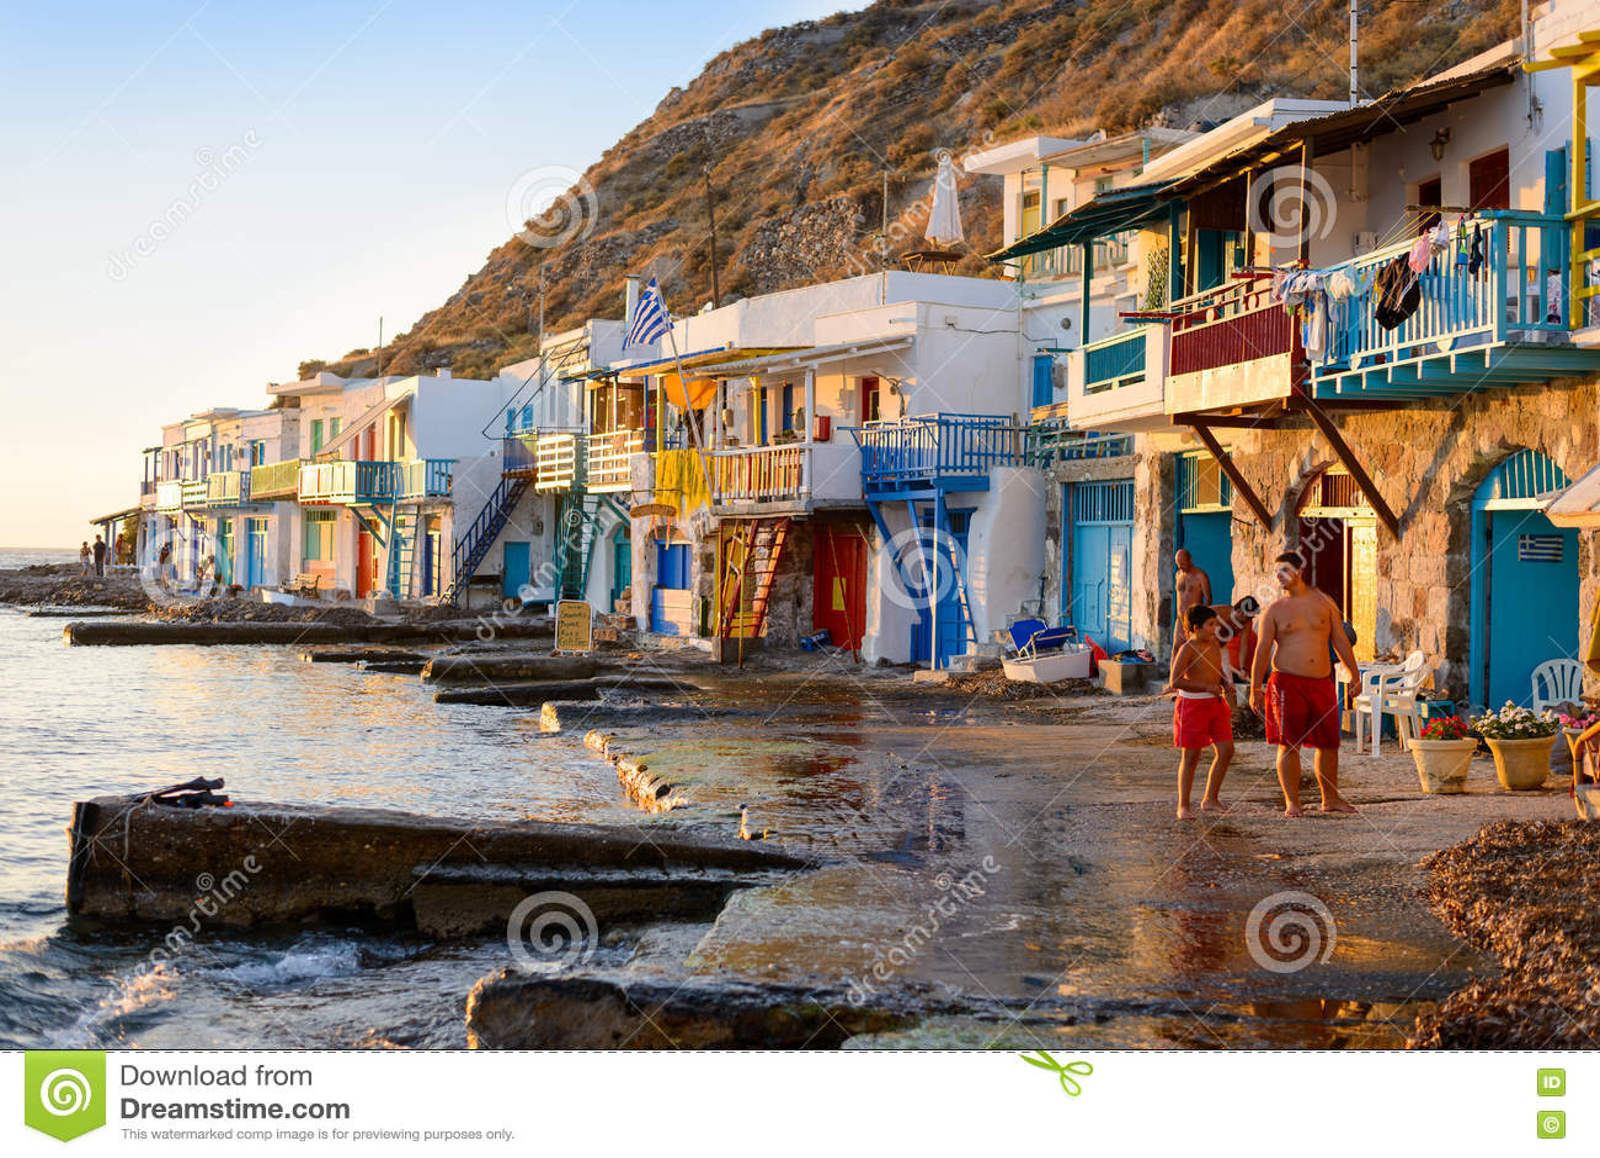 Download Klima, Melos, рыбацкий поселок Редакционное Изображение - изображение насчитывающей село, дома: 72290690